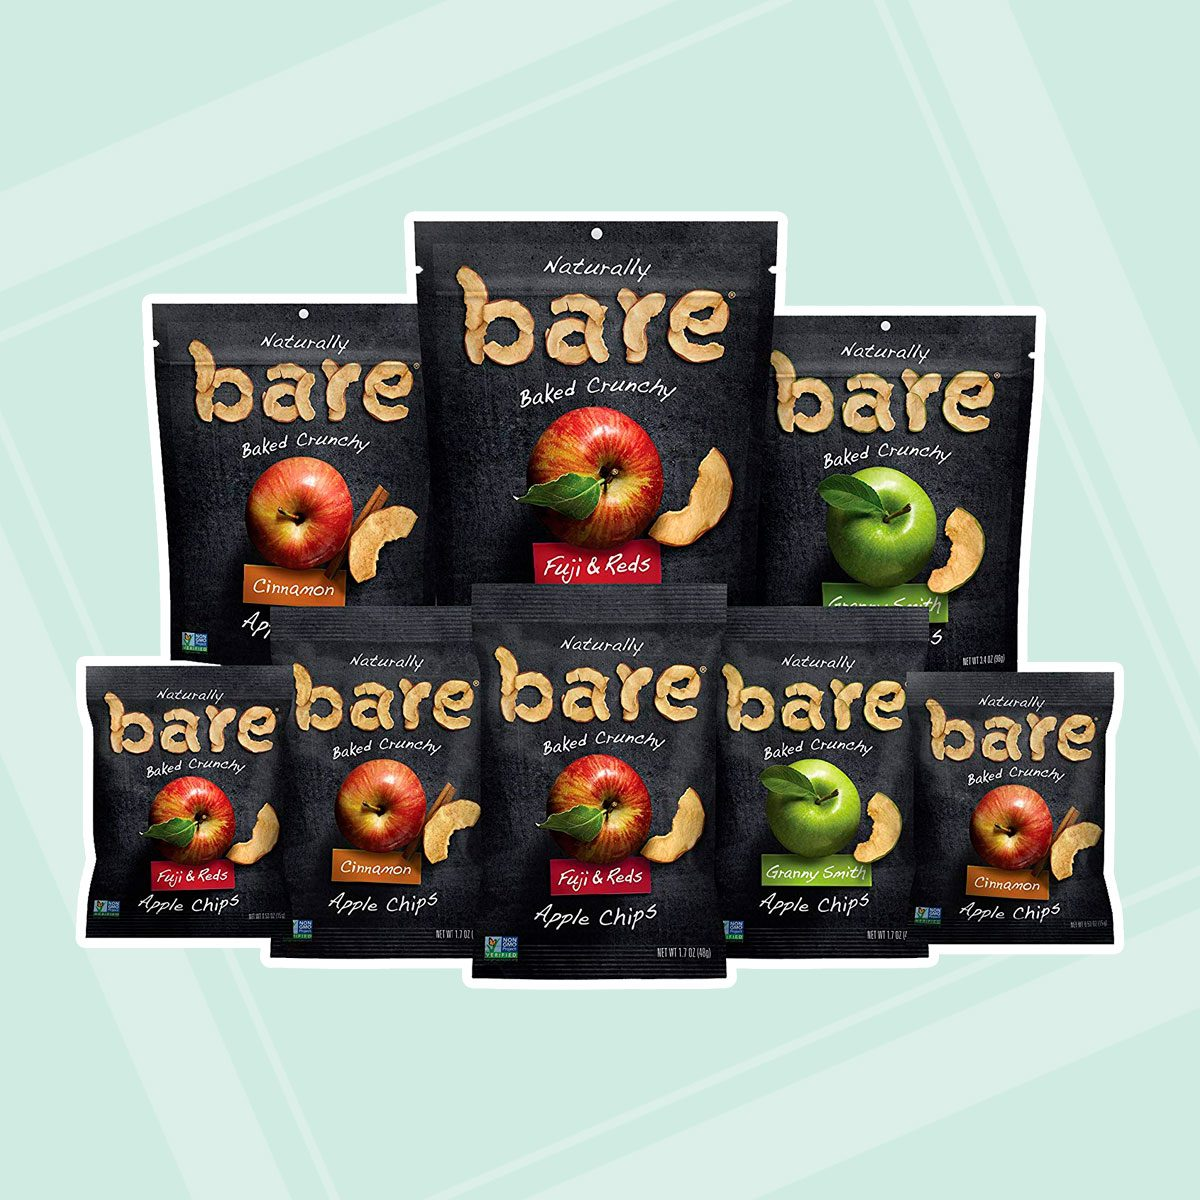 Bare Baked Crunchy Apple Chips